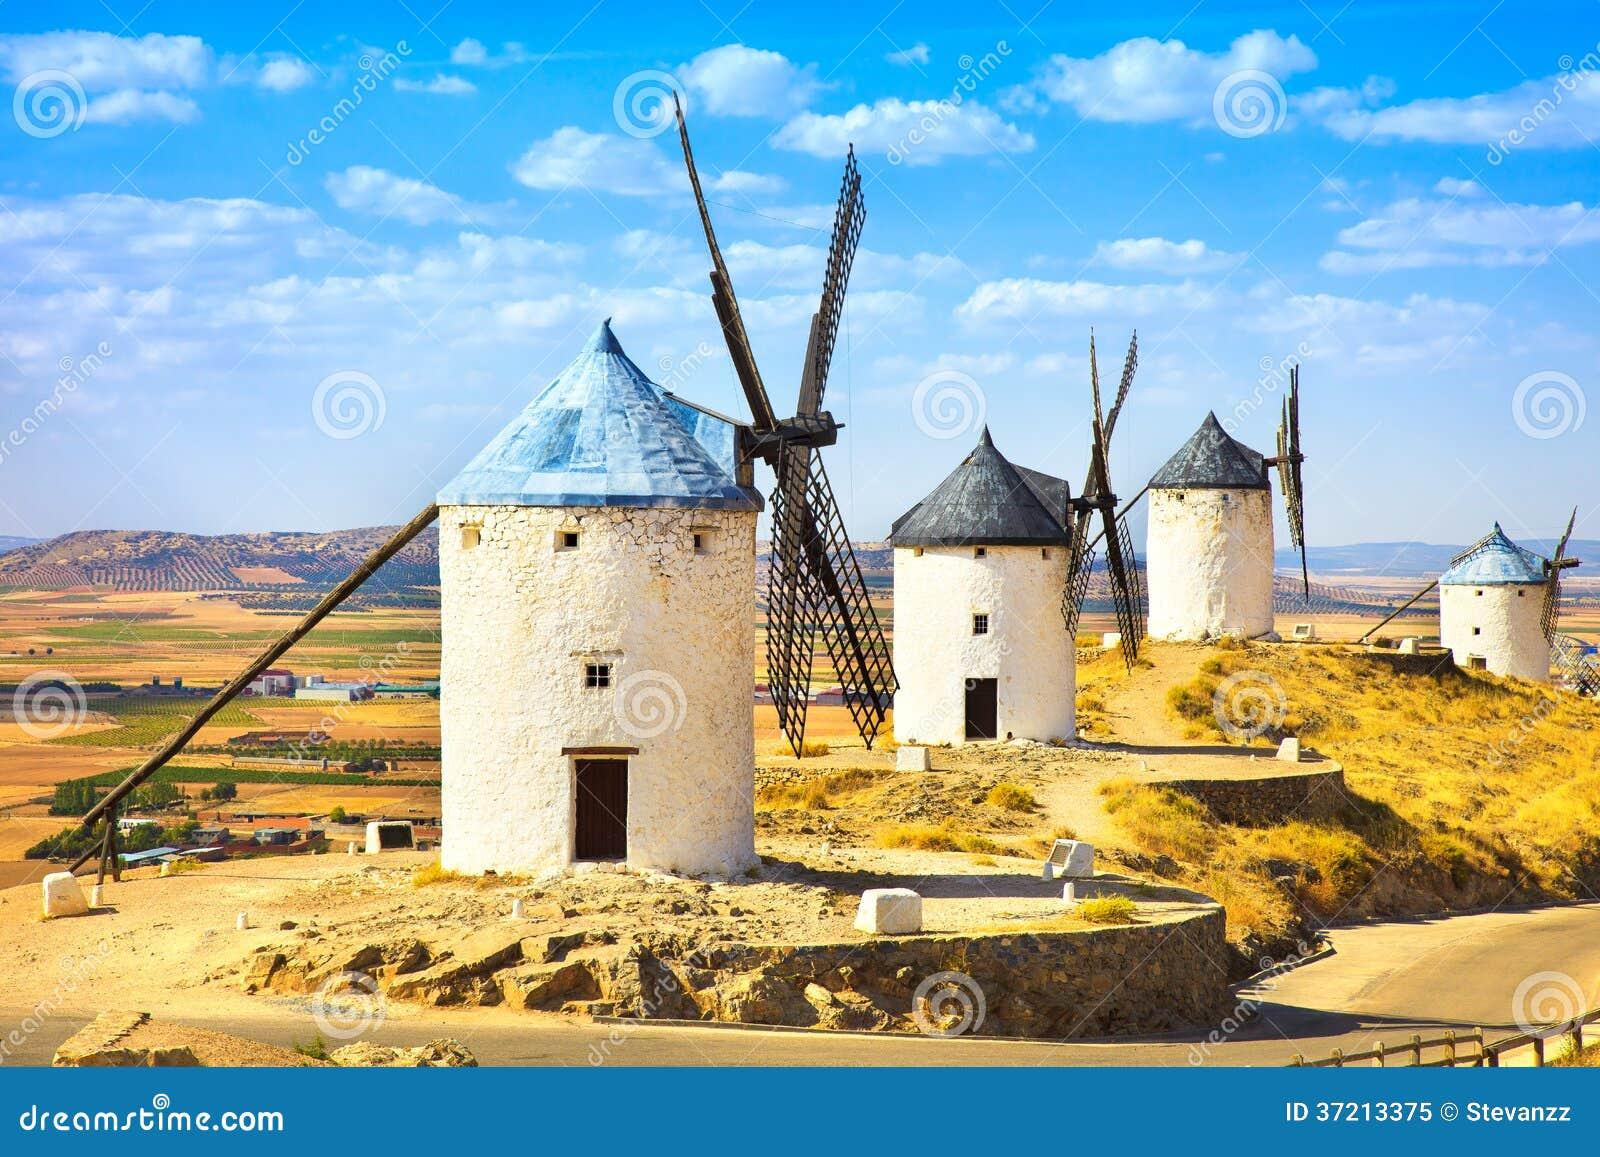 Wiatraczki Don donkiszot w Consuegra. Castile los angeles Mancha, Hiszpania